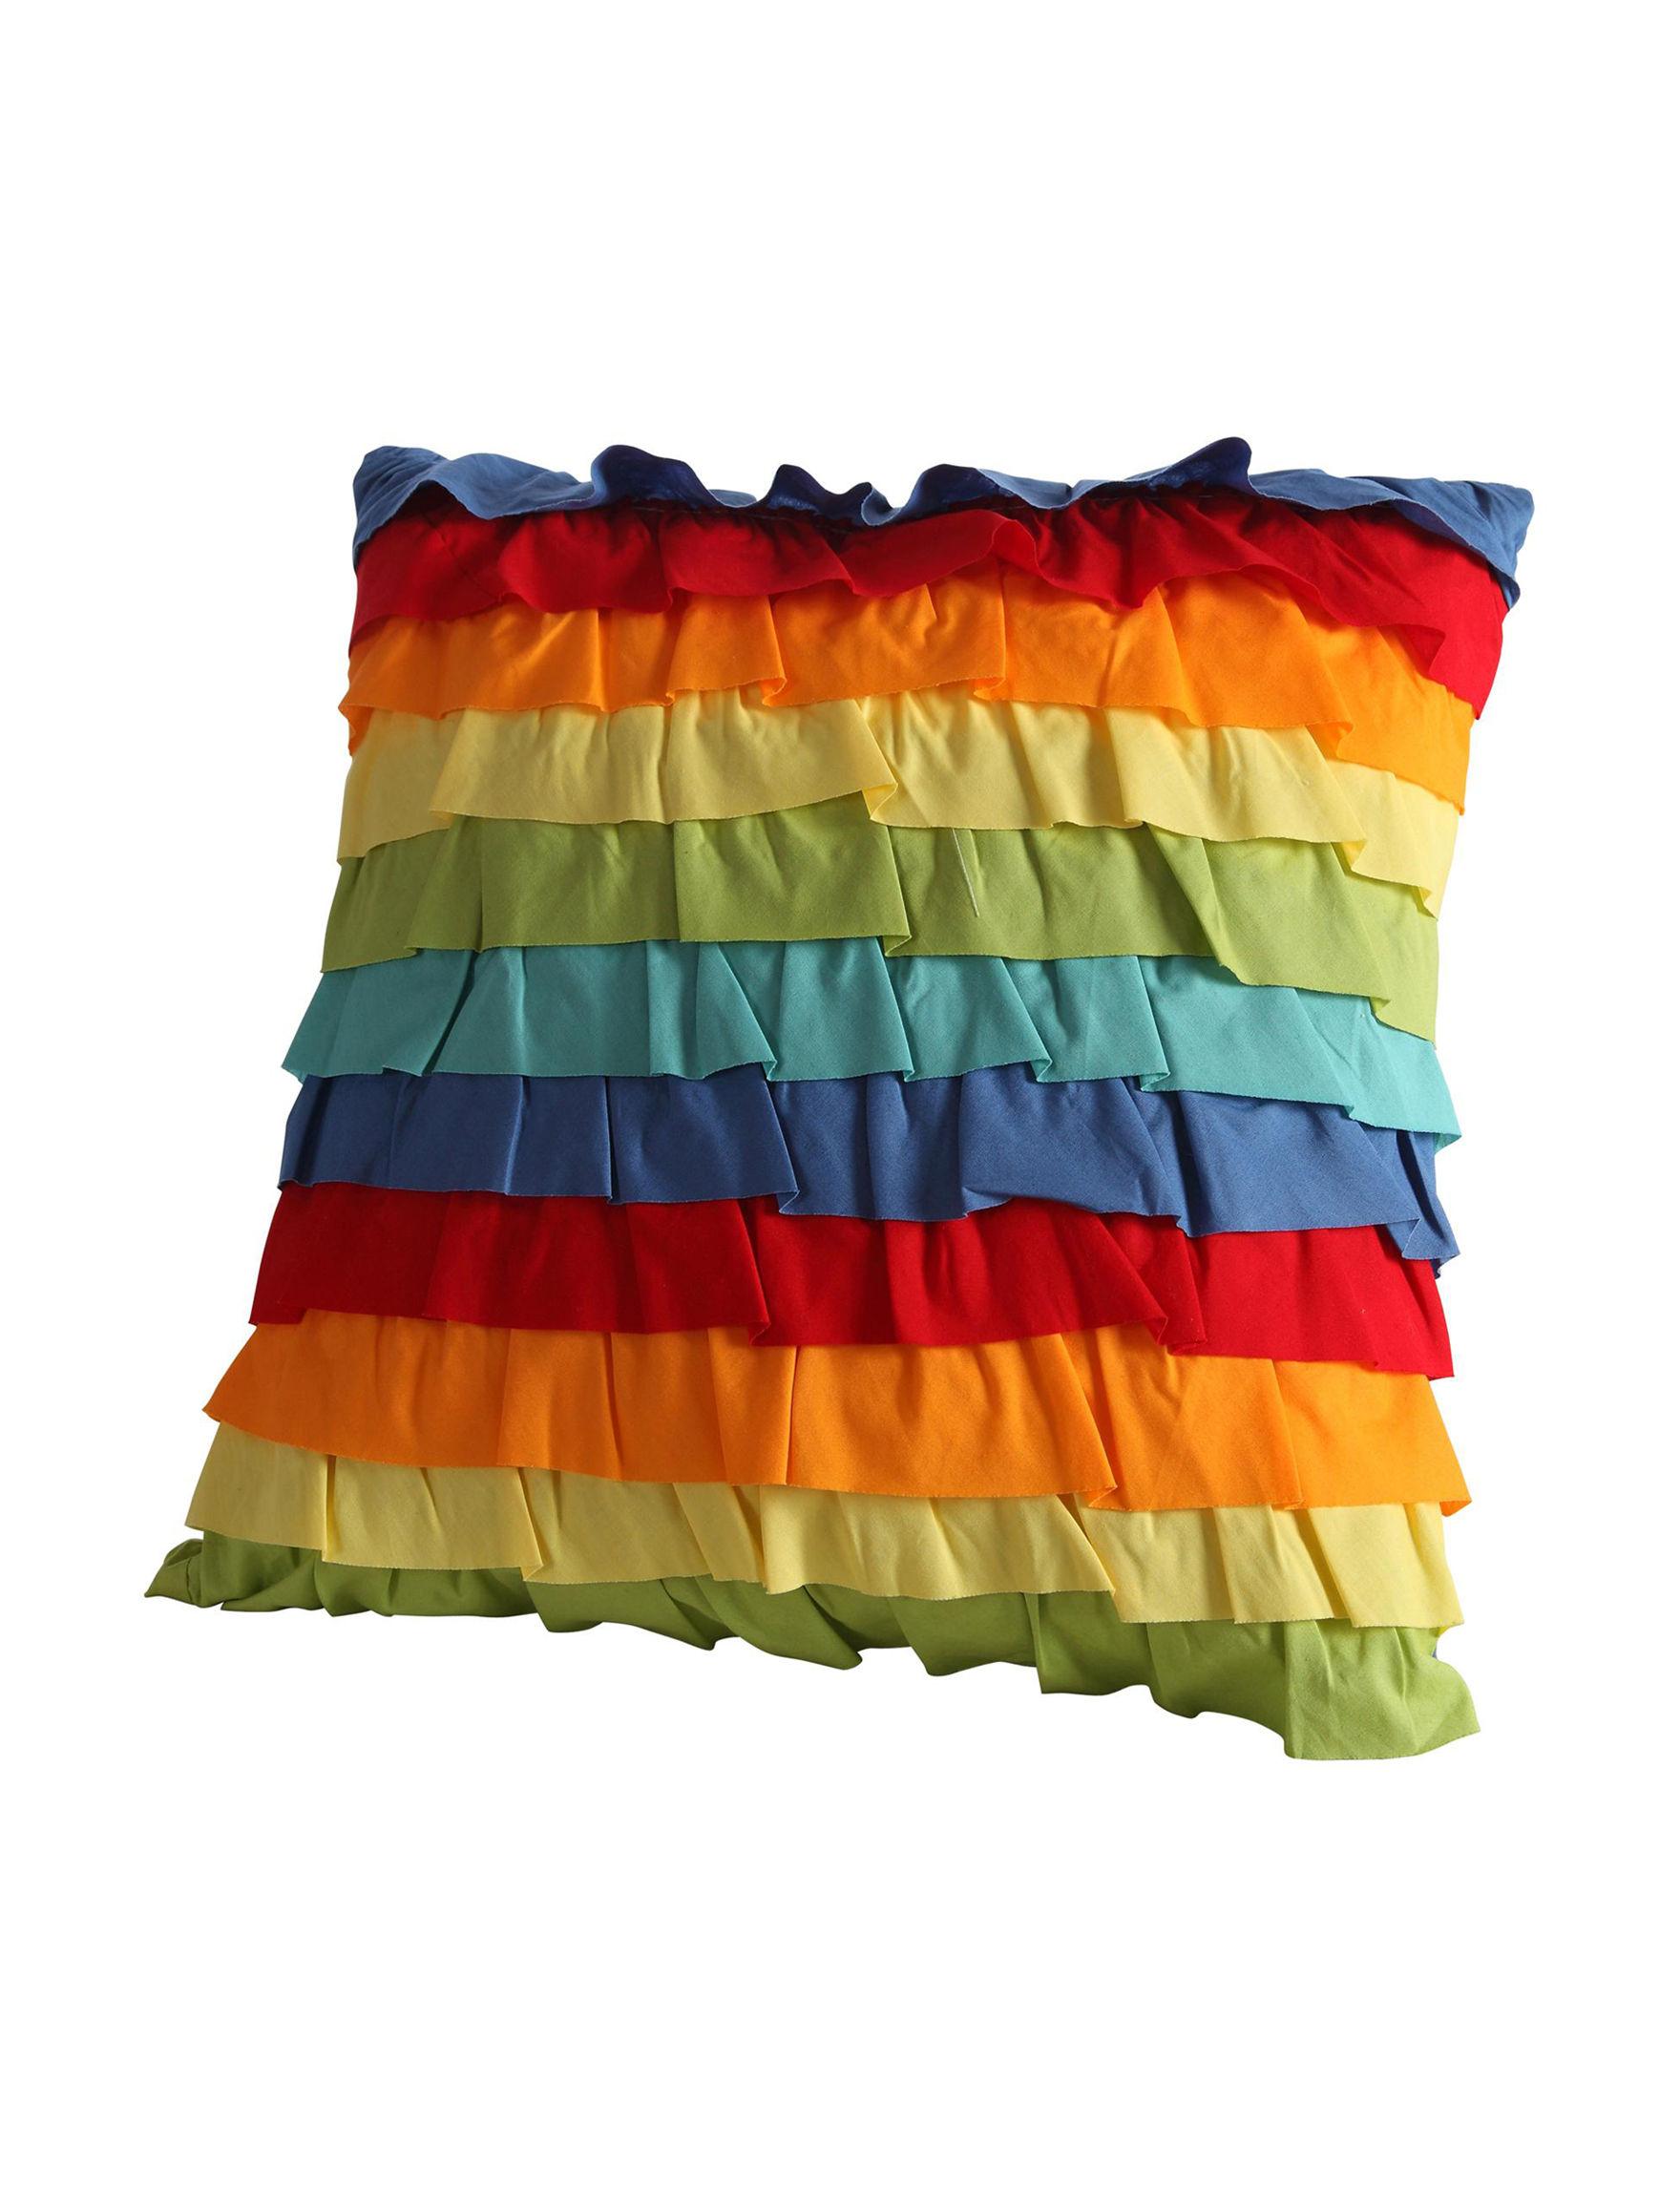 Fiesta Rainbow Decorative Pillows